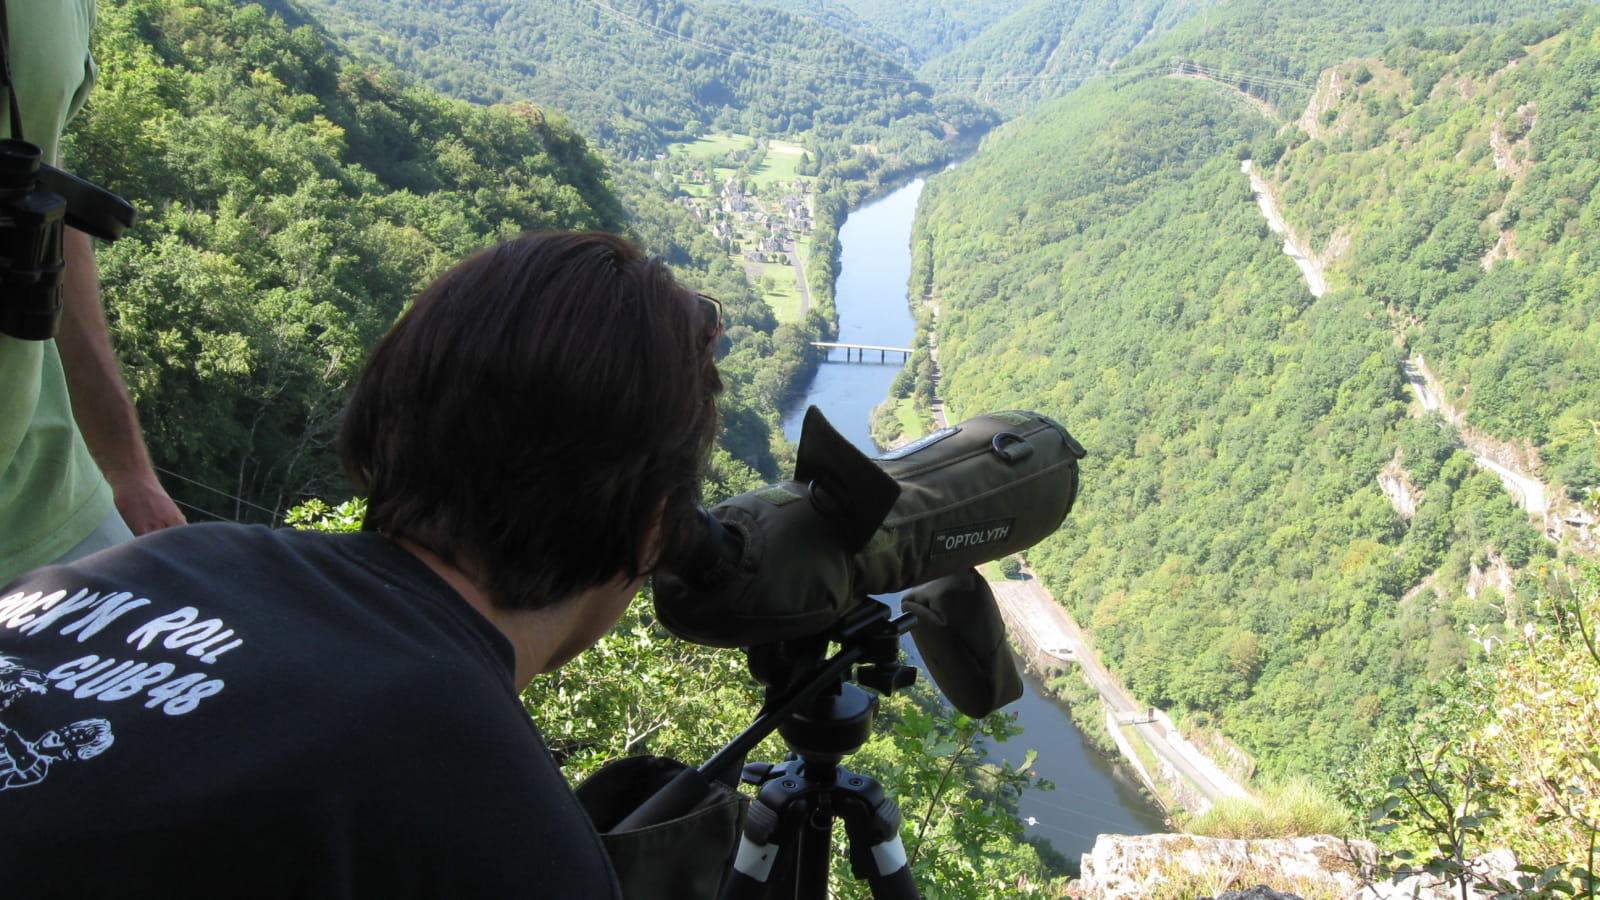 Sentier ornitho de l'Aigle - 6,2 km